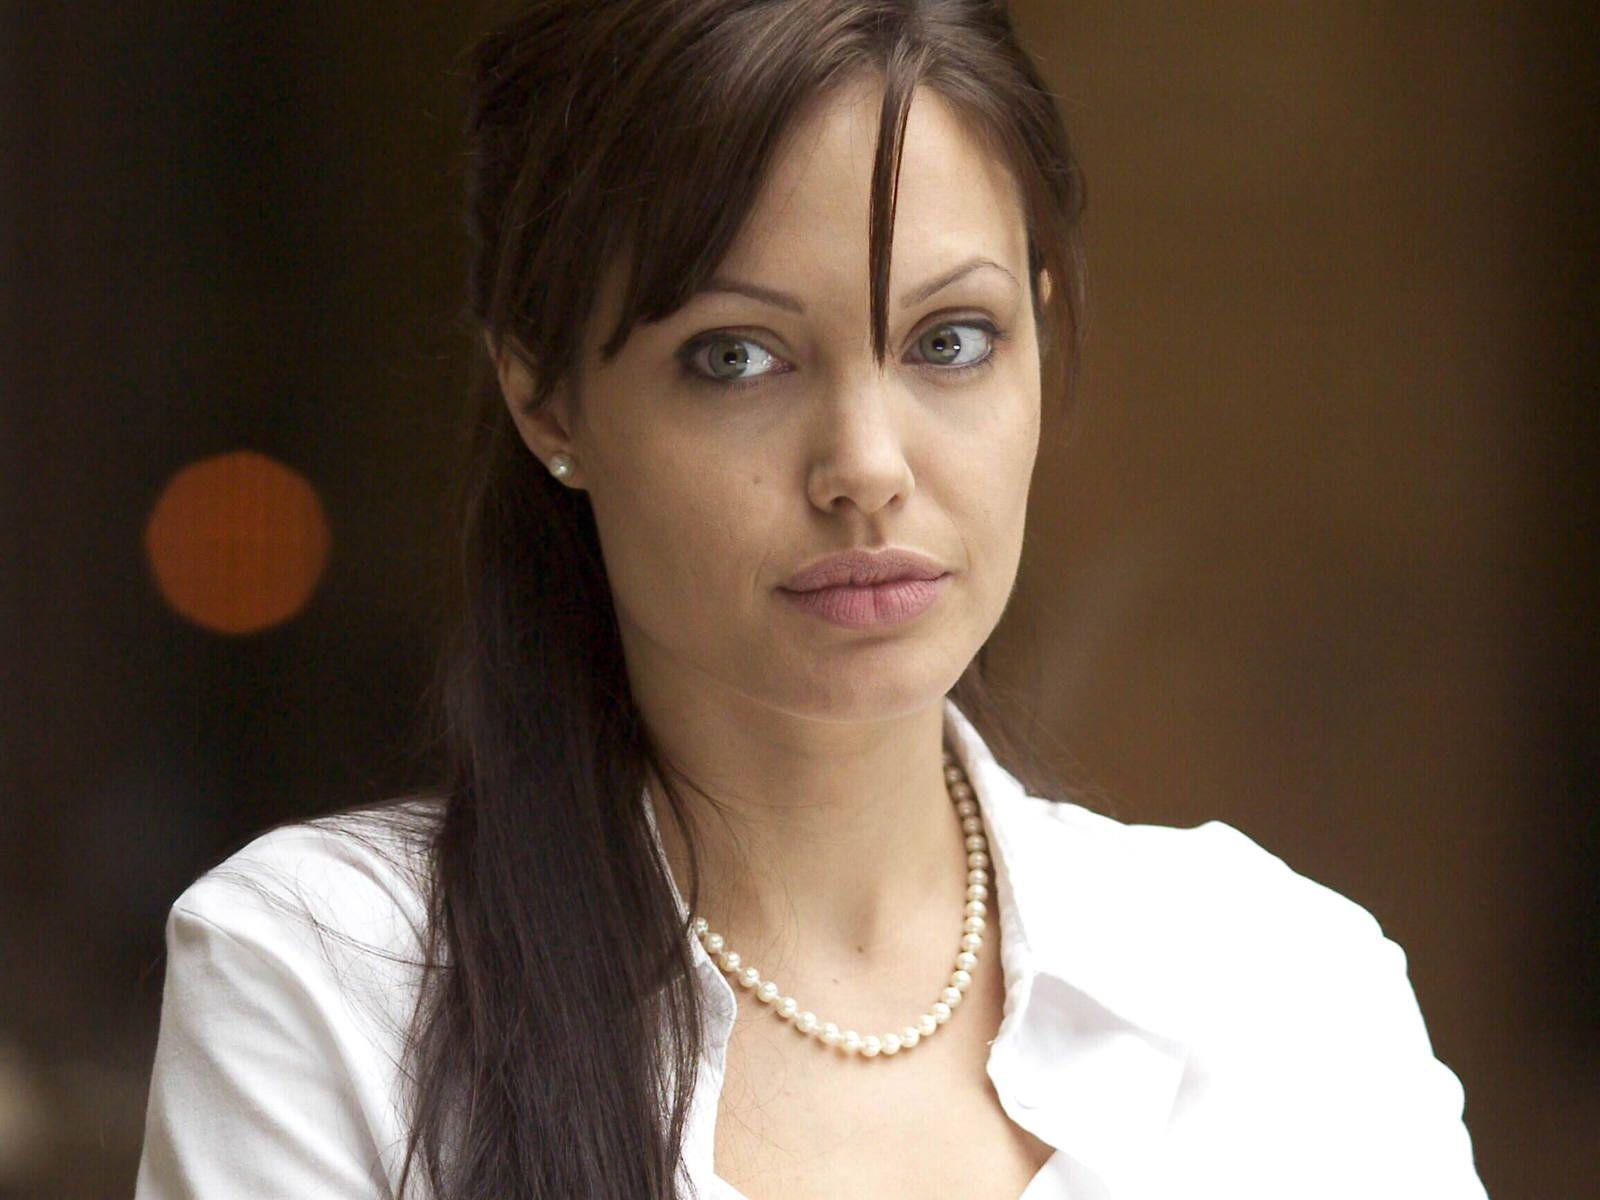 Angelina Jolie: Angelina Jolie